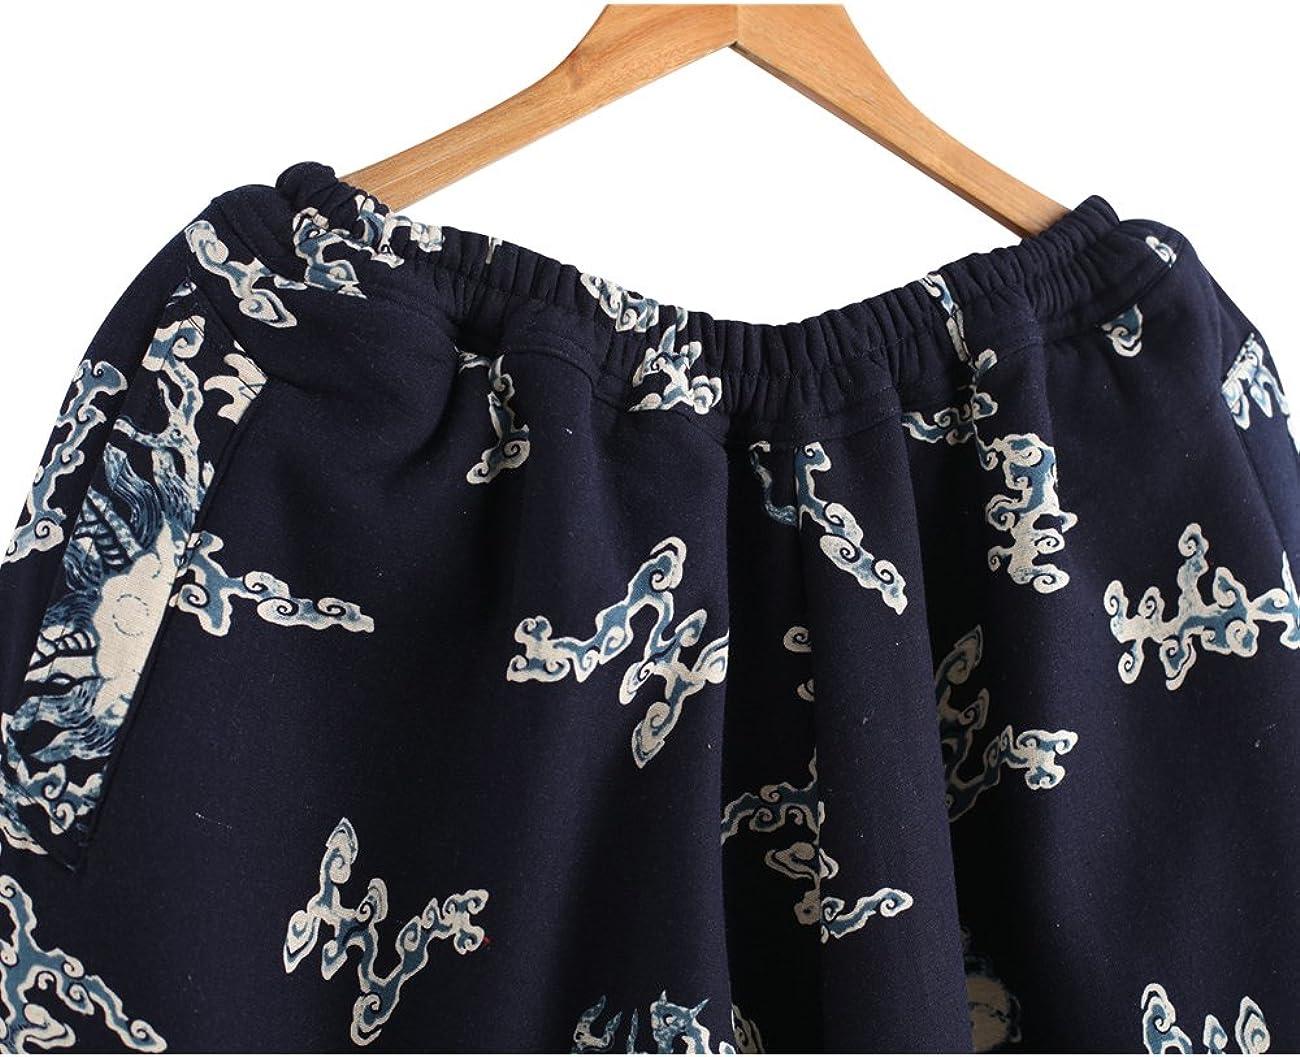 Zoulee Mens New Elastic Waist Drop Crotch Printed Harem Pants